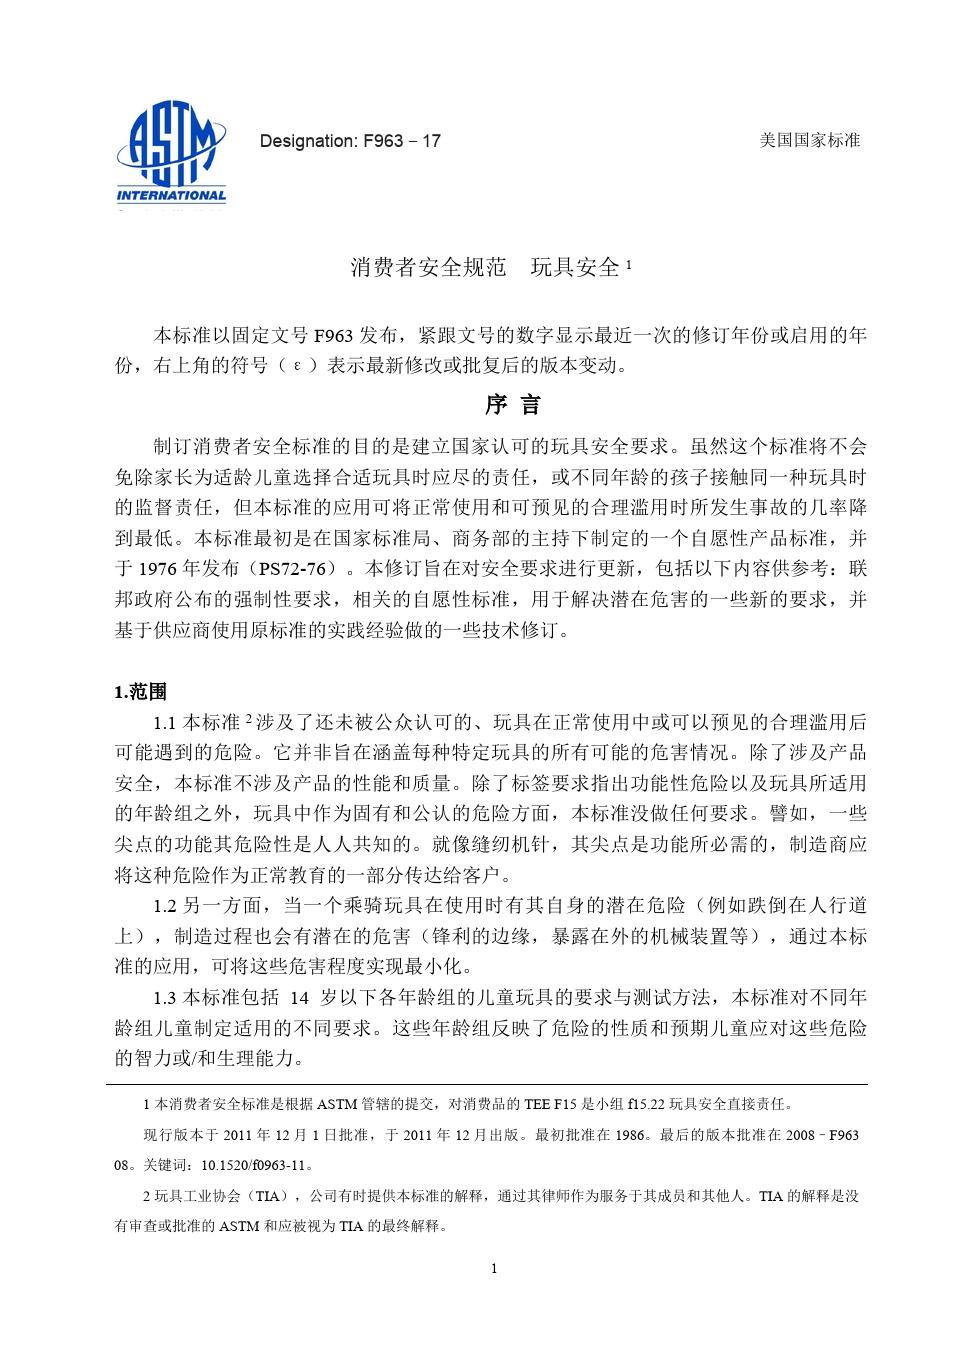 astm f963 中文 版